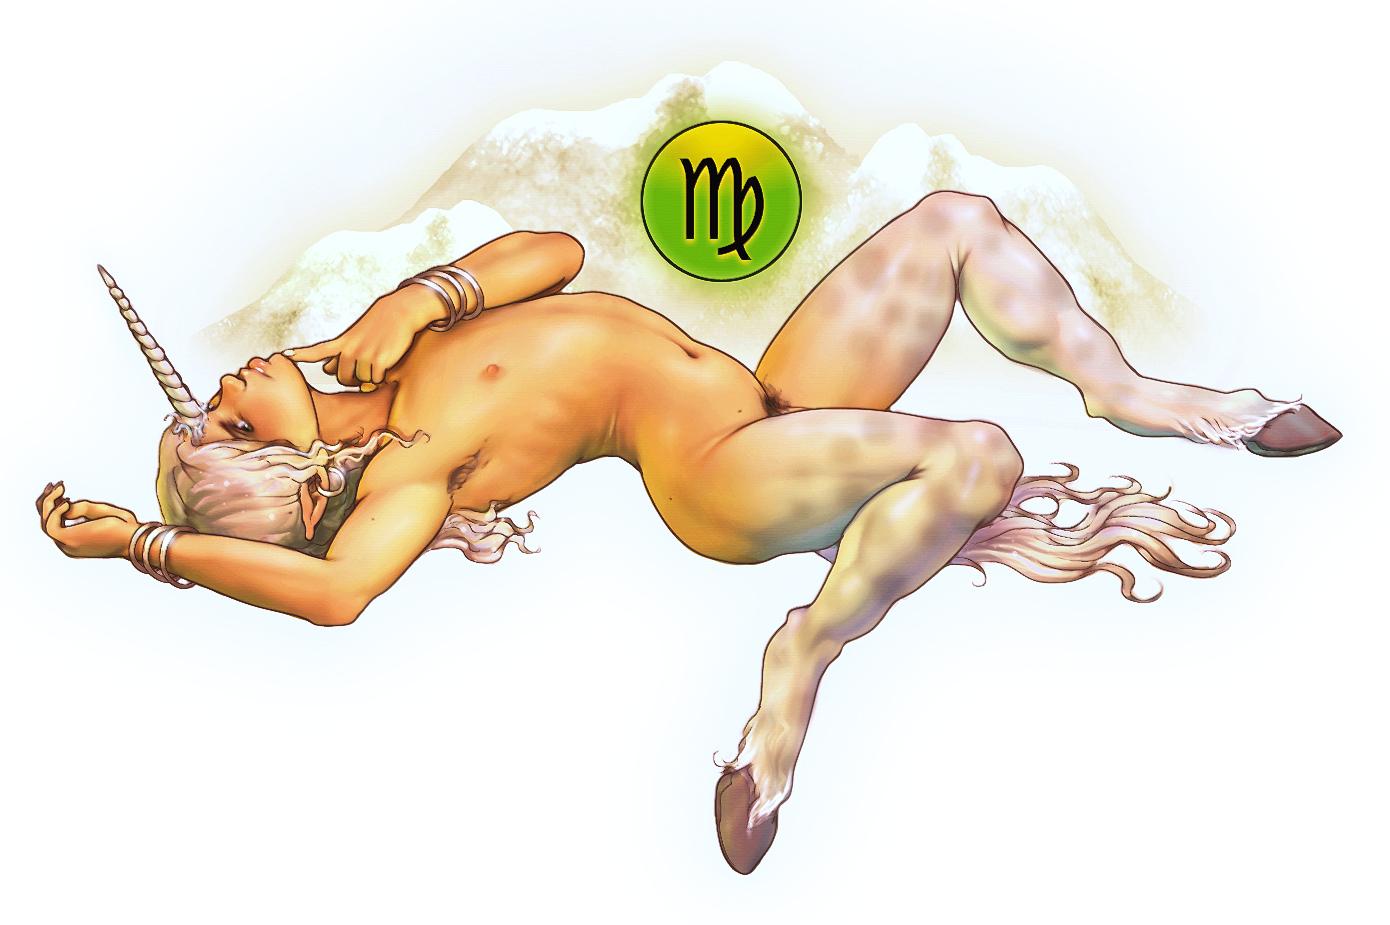 oven-lyubov-seks